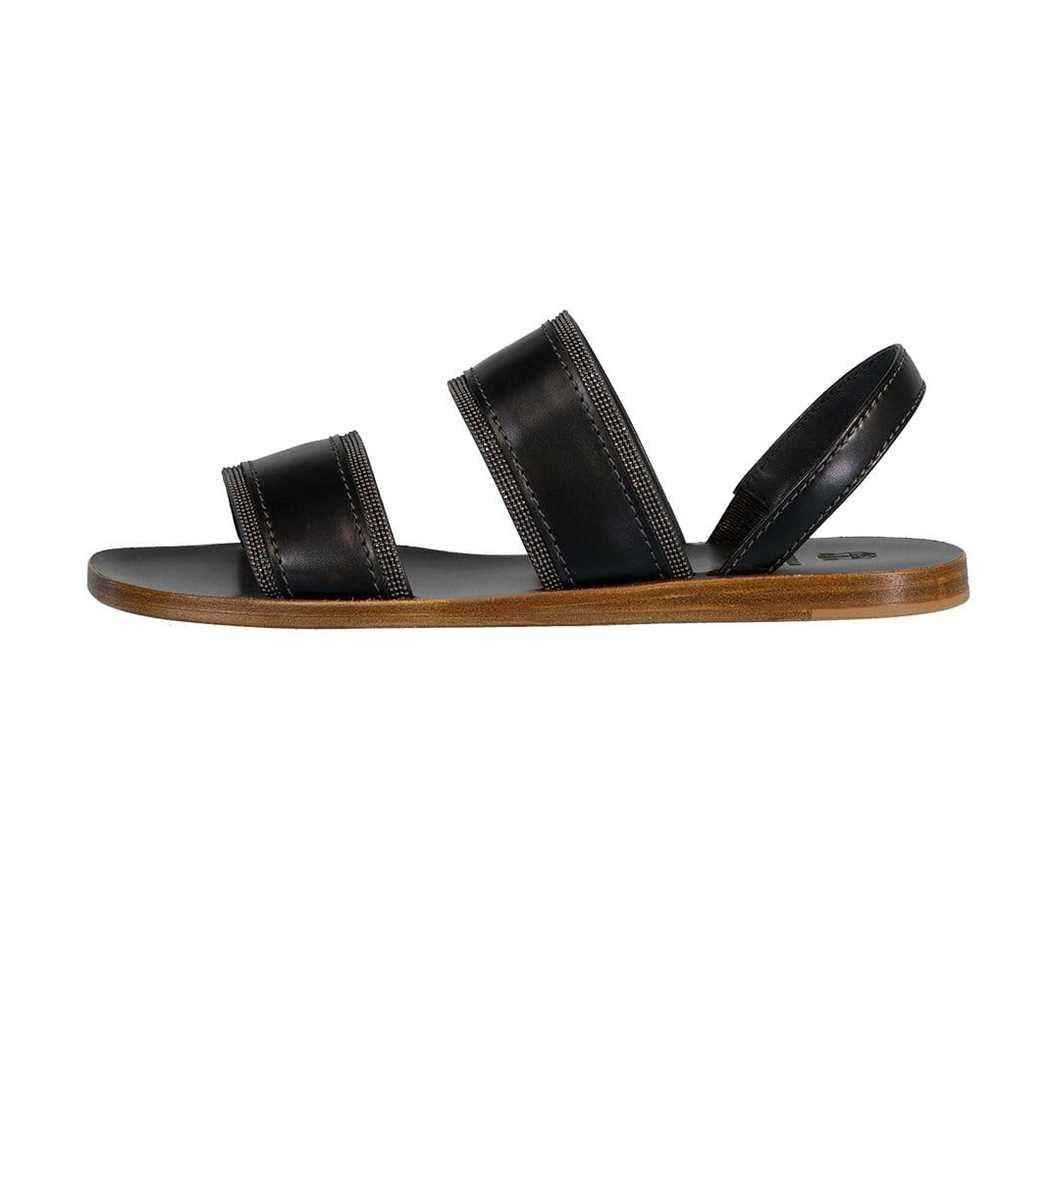 Brunello Cucinelli Black Strap Flat Sandal